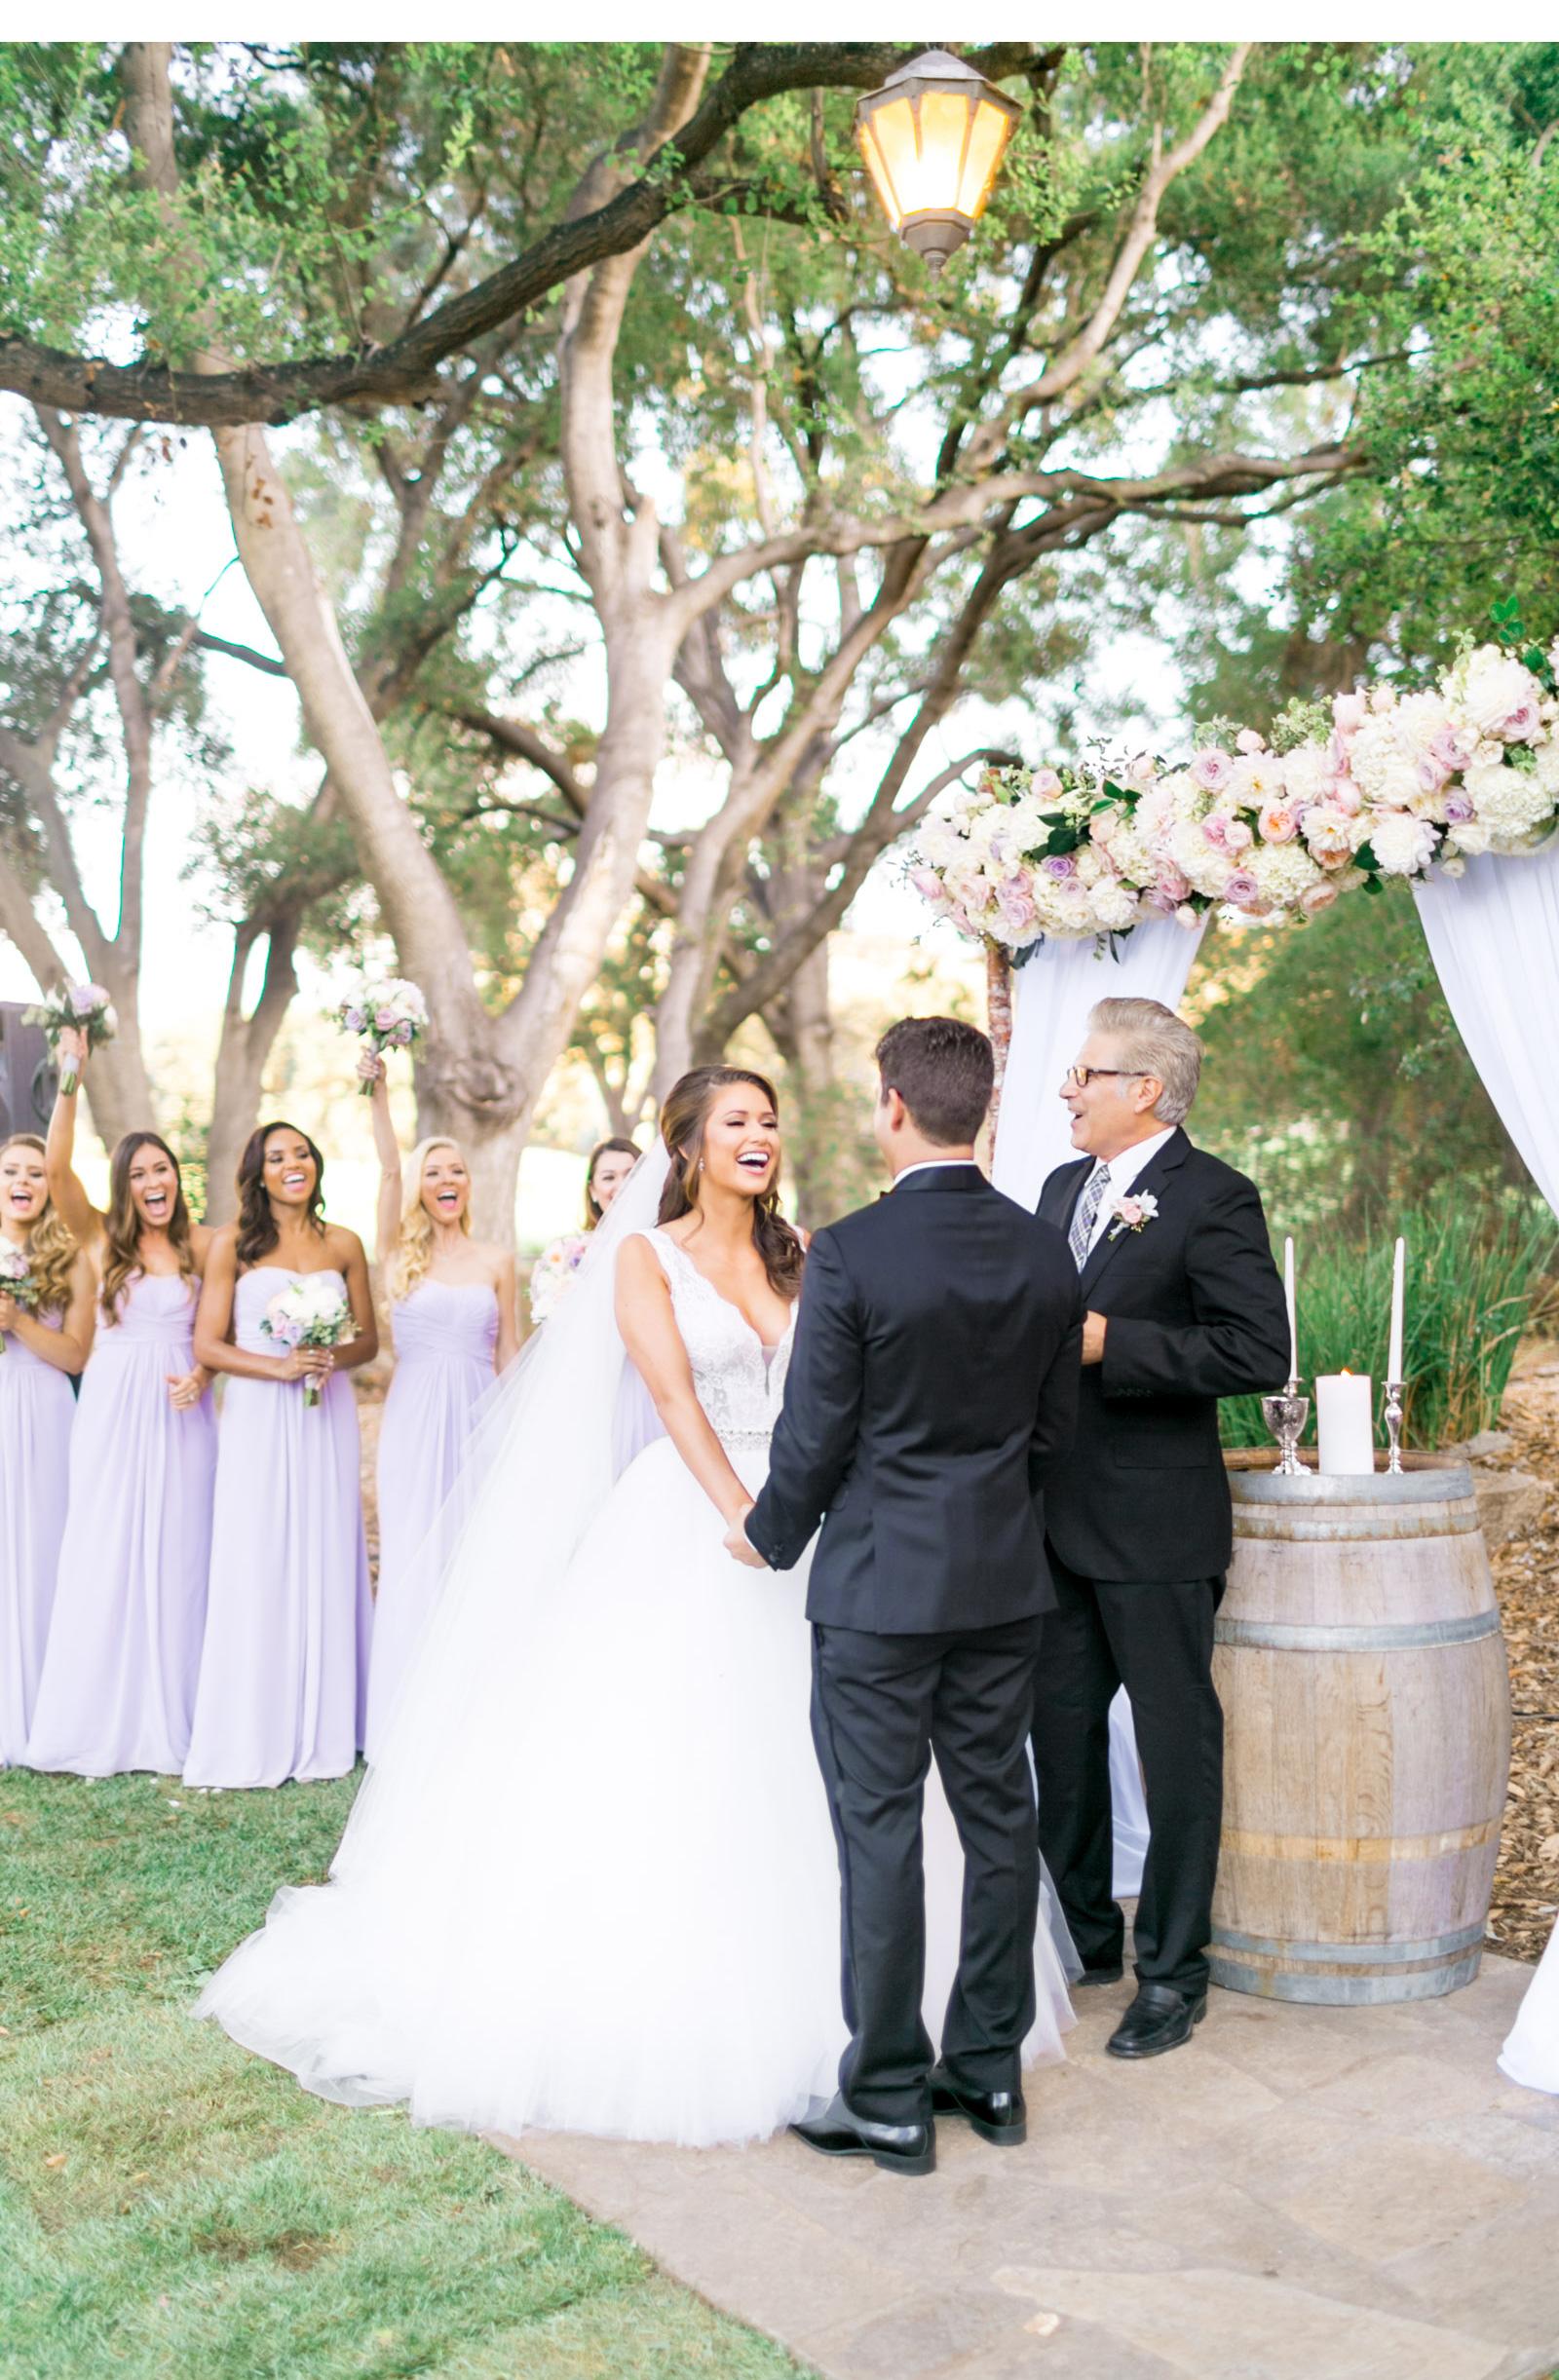 Miss-USA-Wedding-Ceremony-Natalie-Schutt-Photography_03.jpg